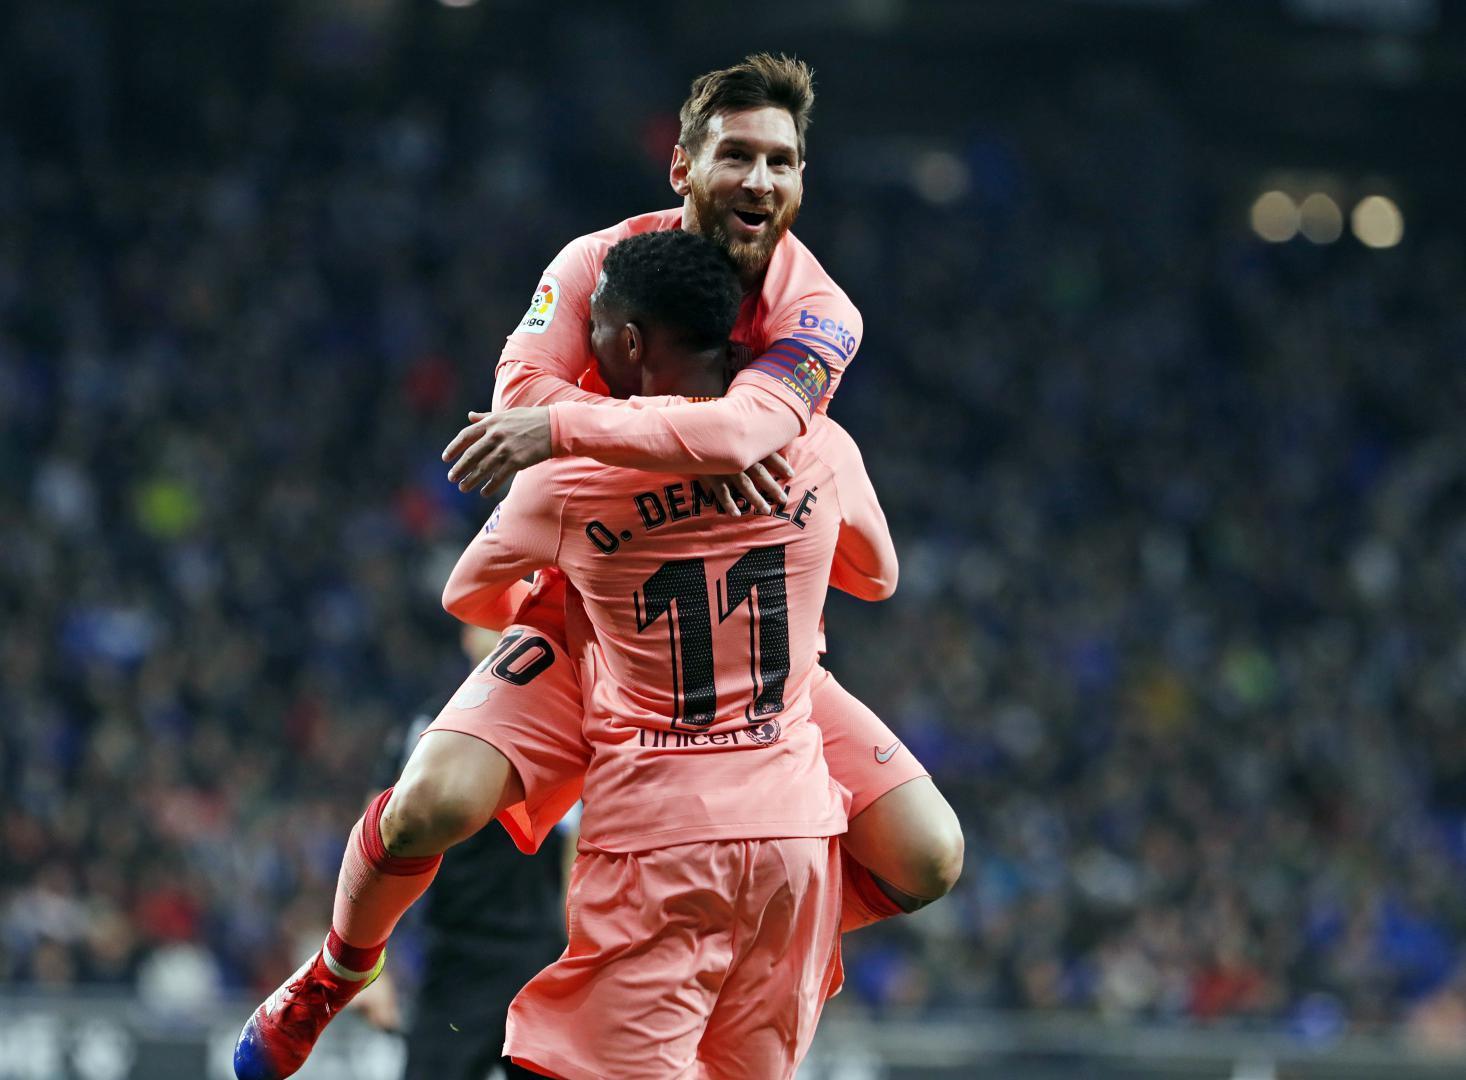 Top Ten goals so far in La Liga